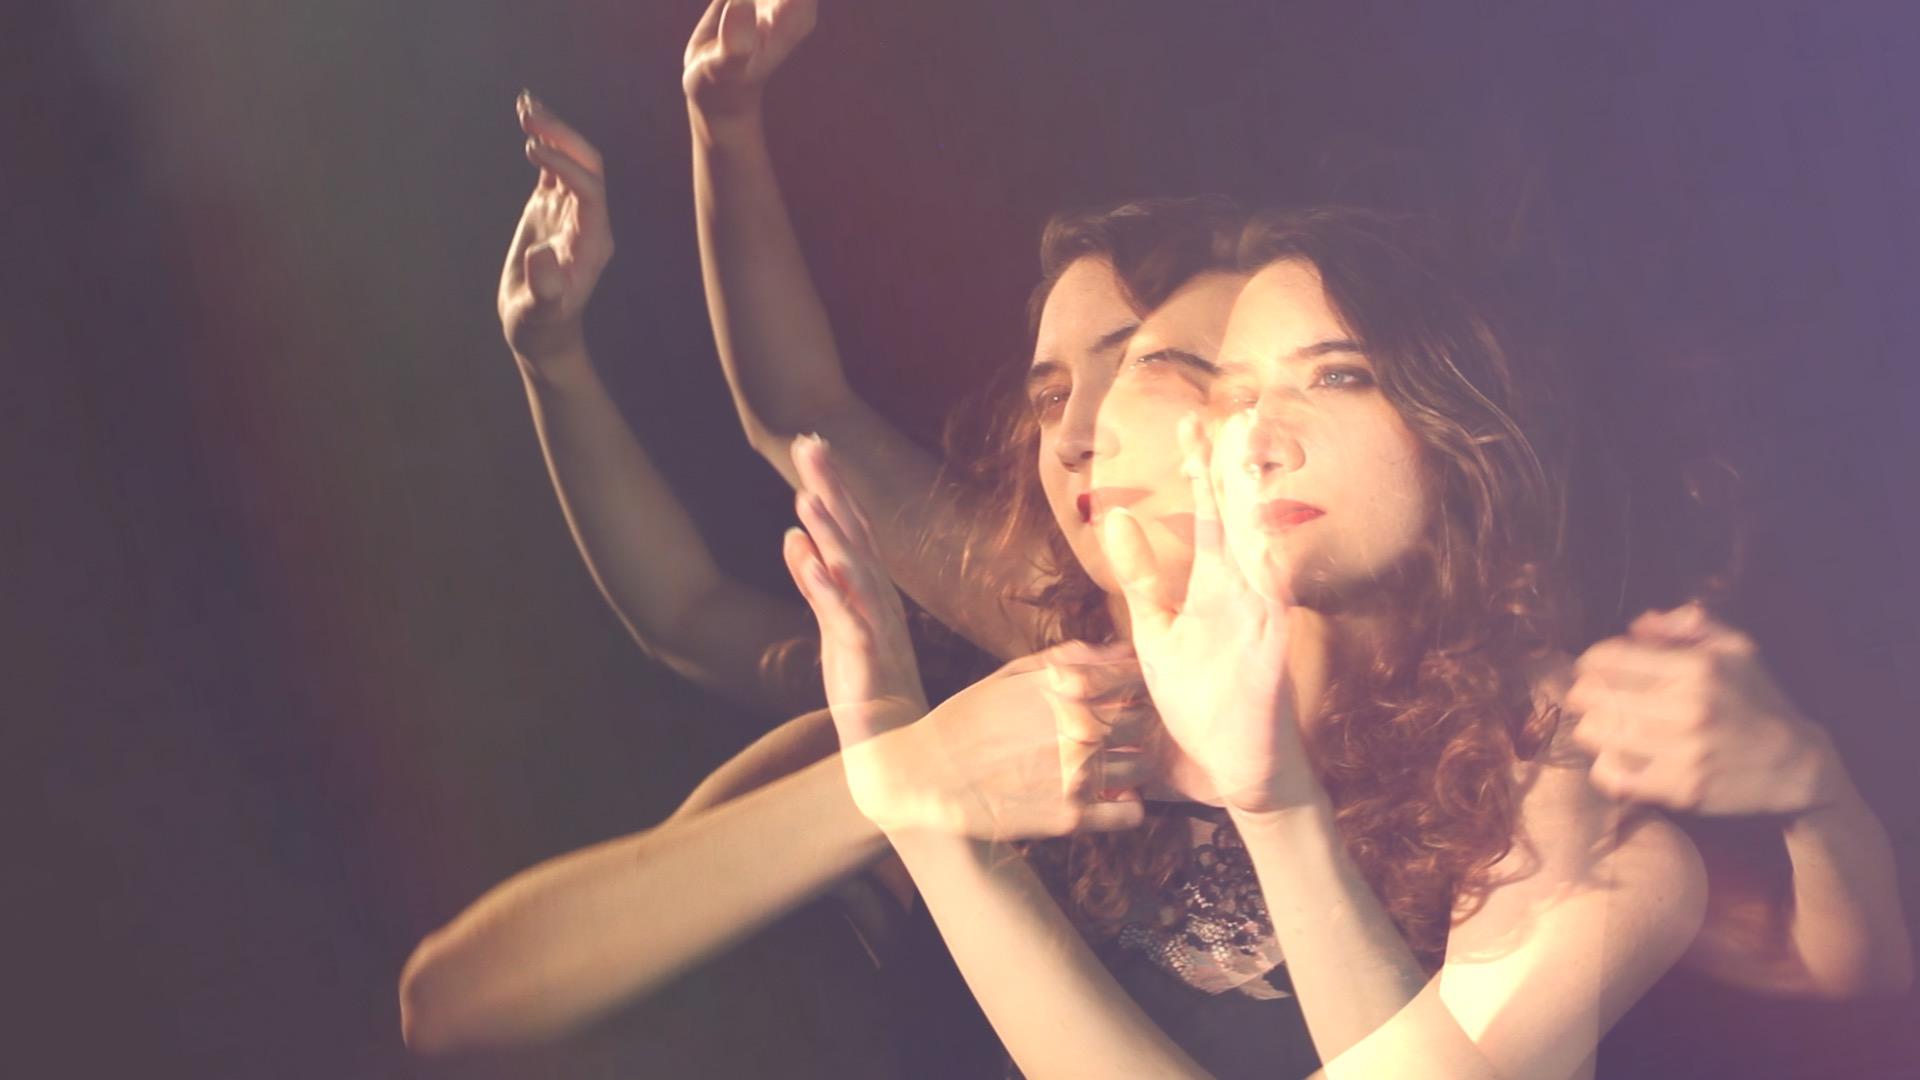 clip video musique – dream clip – Juste en rêvant – Manon Novak -viviane -riberaigua -realisateur music video director. 1